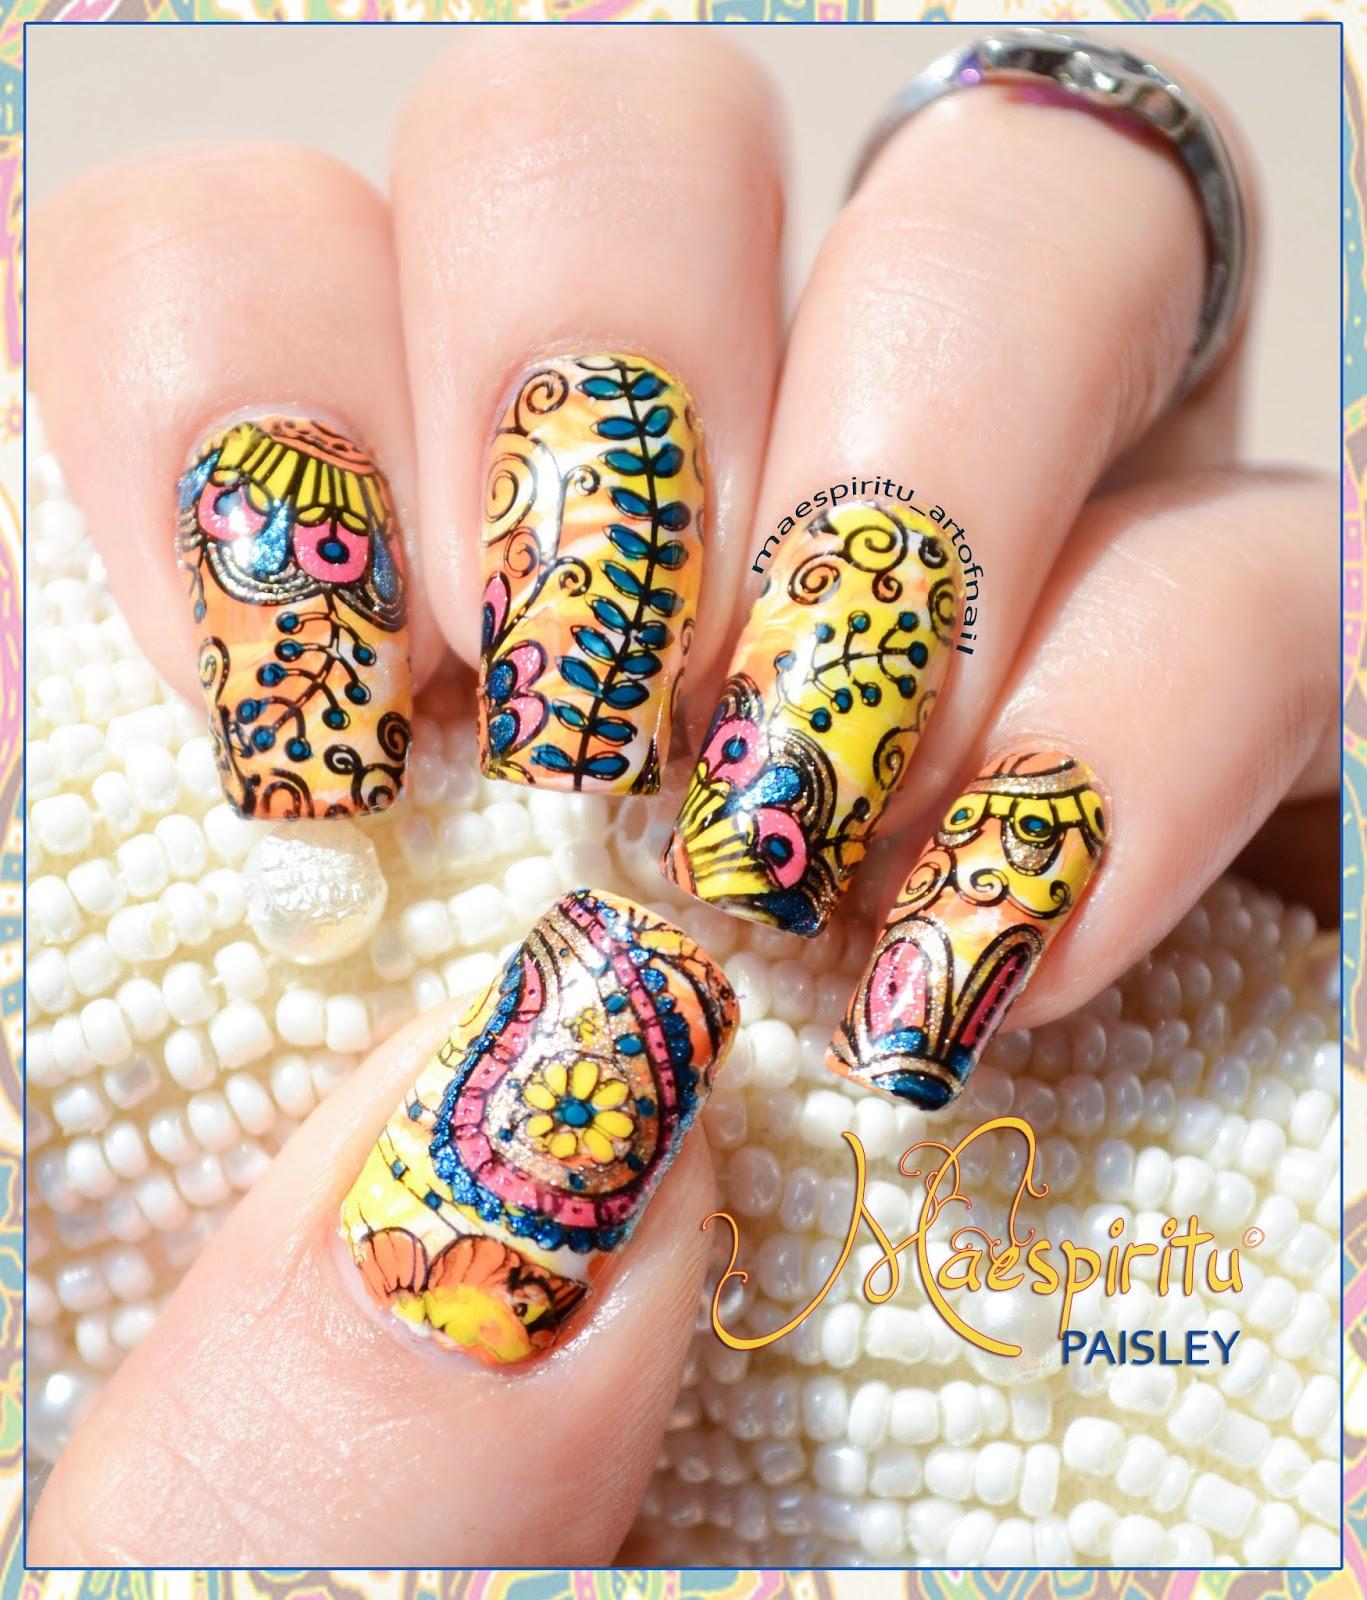 Paisley Nail Art: ART OF NAIL: Paisley Nail Art